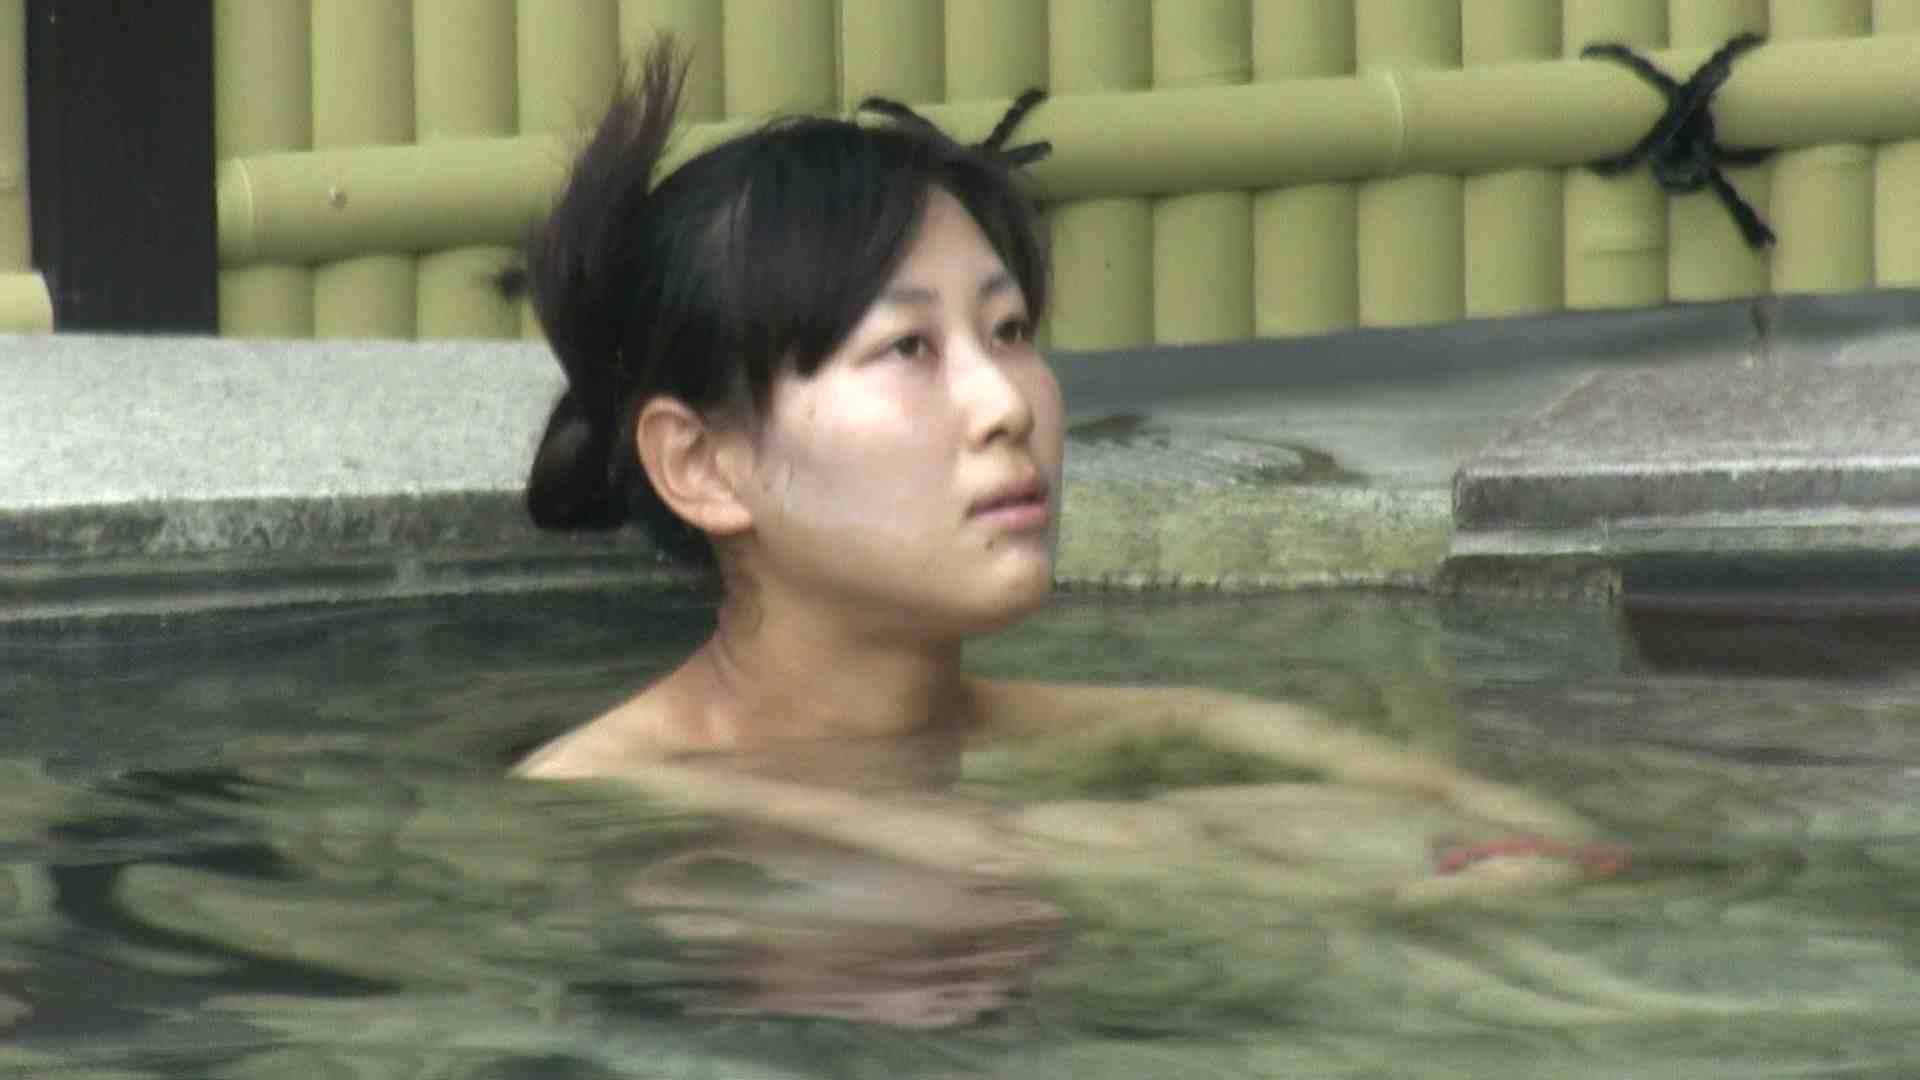 Aquaな露天風呂Vol.665 HなOL   盗撮  104pic 34